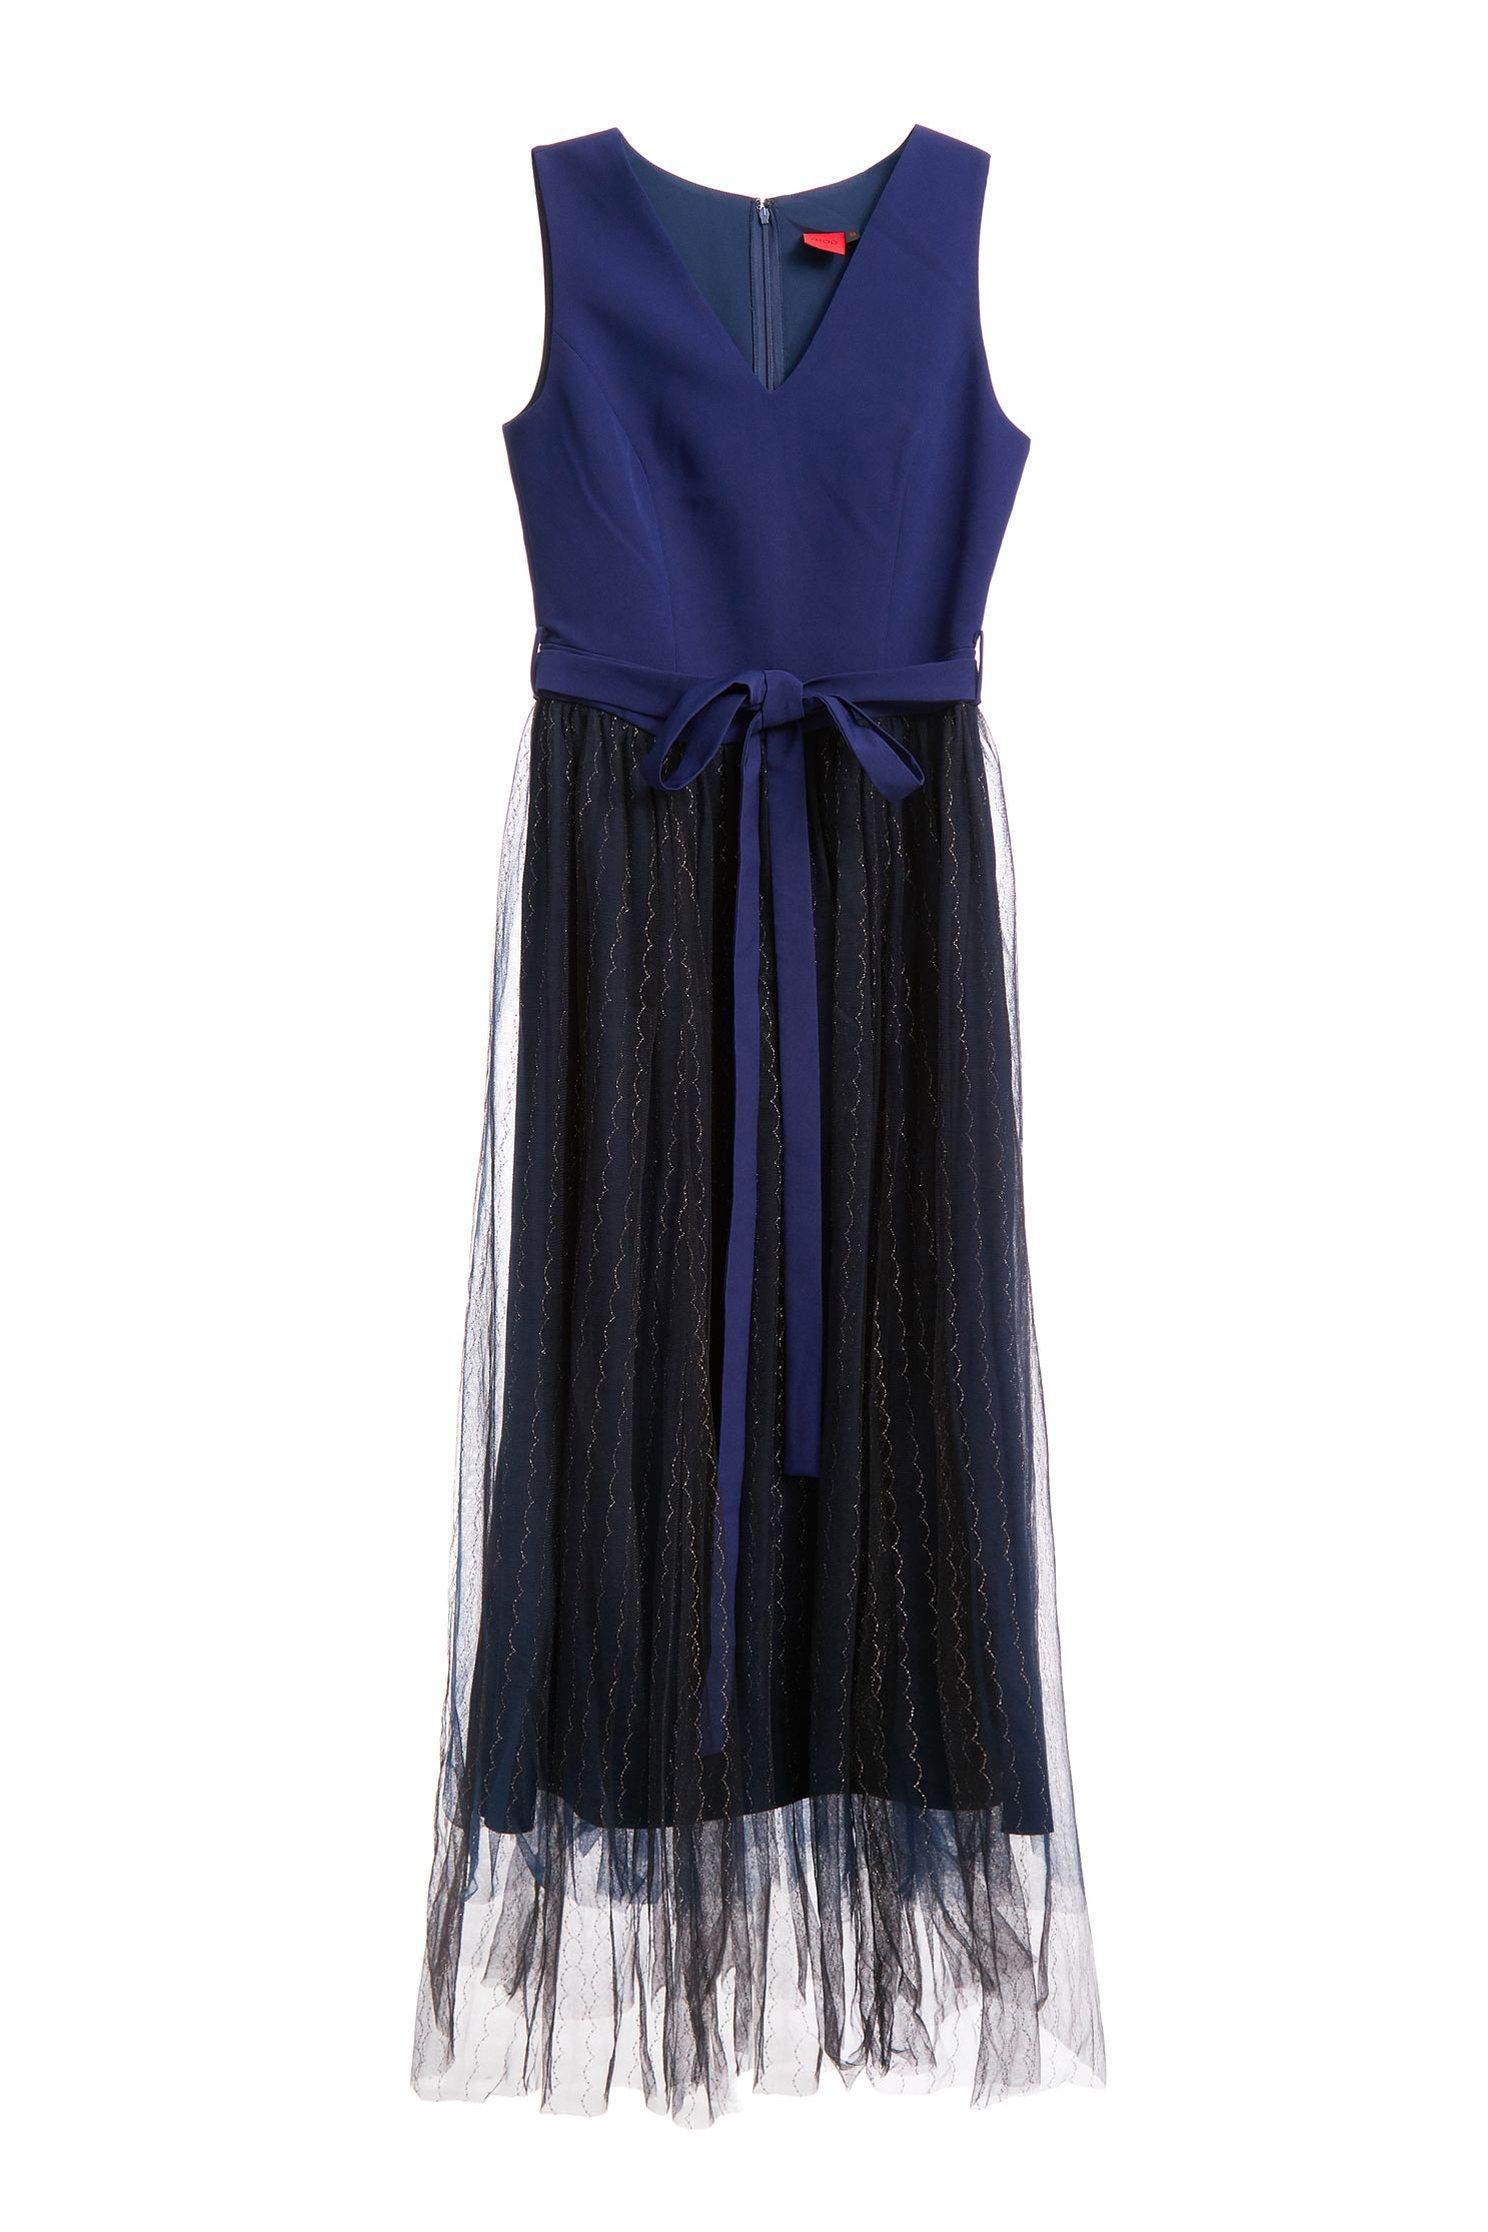 V-neck gauze stitching sleeveless dress